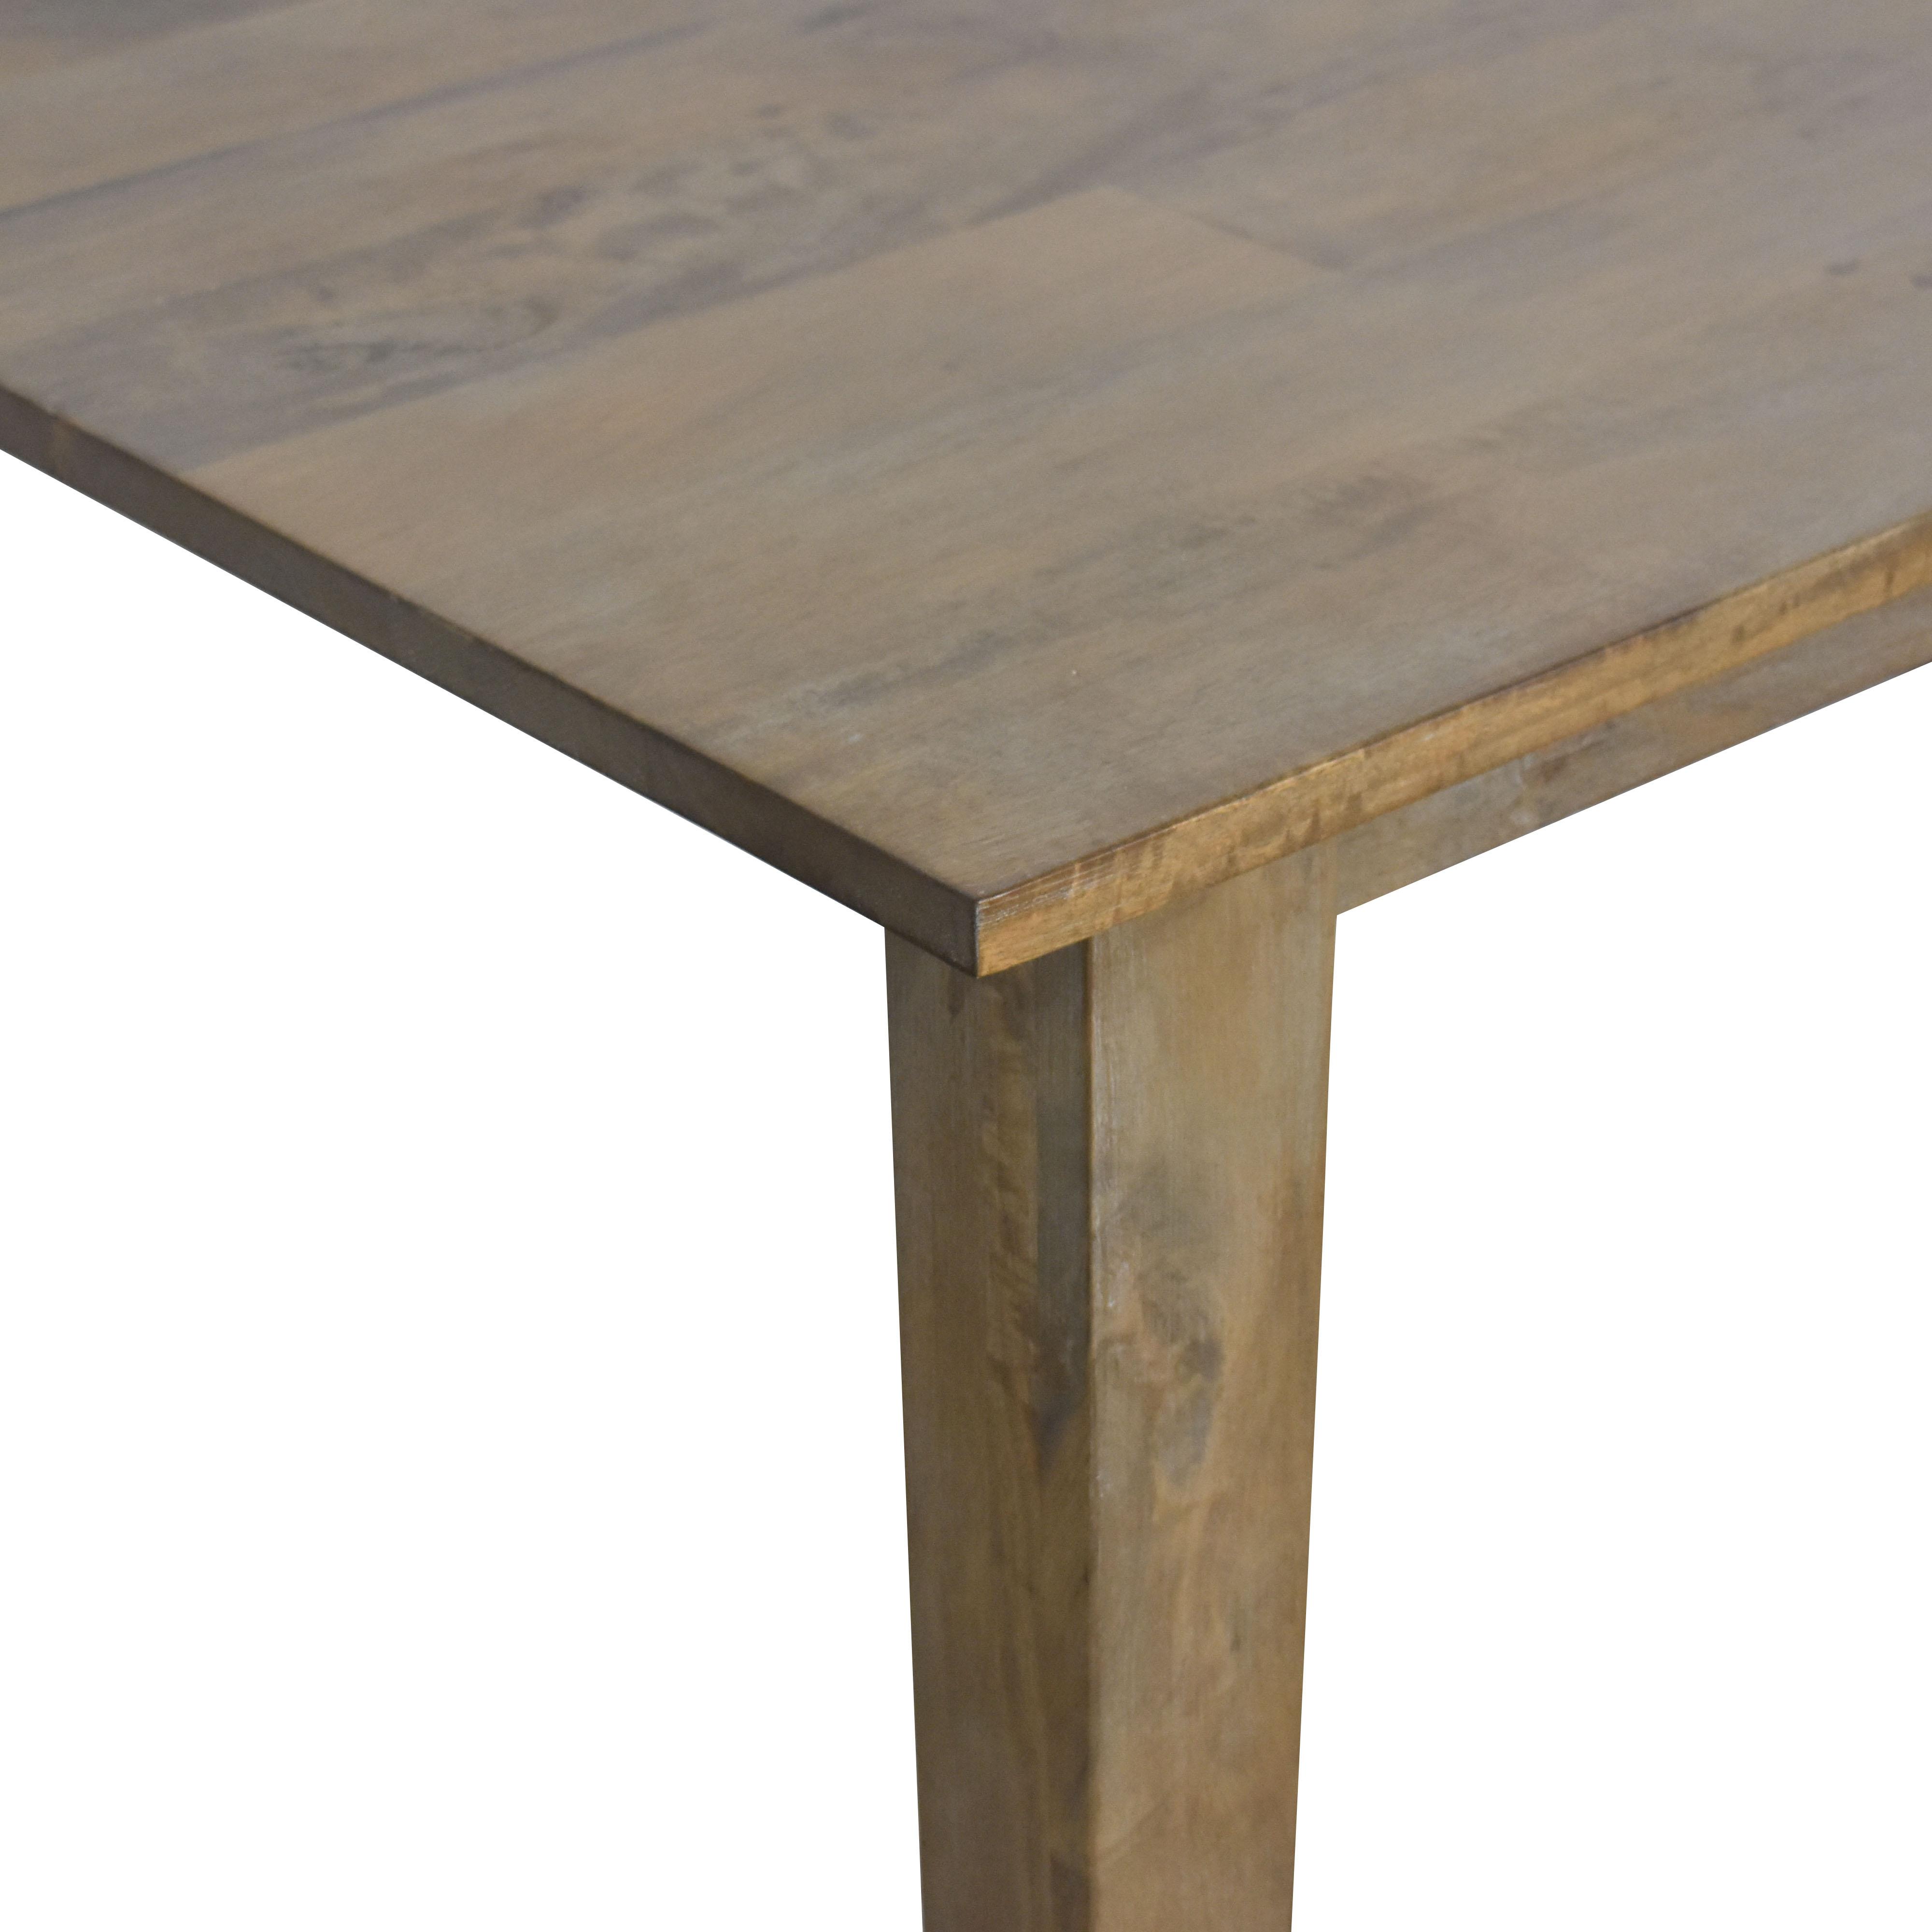 Crate & Barrel Crate & Barrel Basque Grey Wash Dining Table light brown